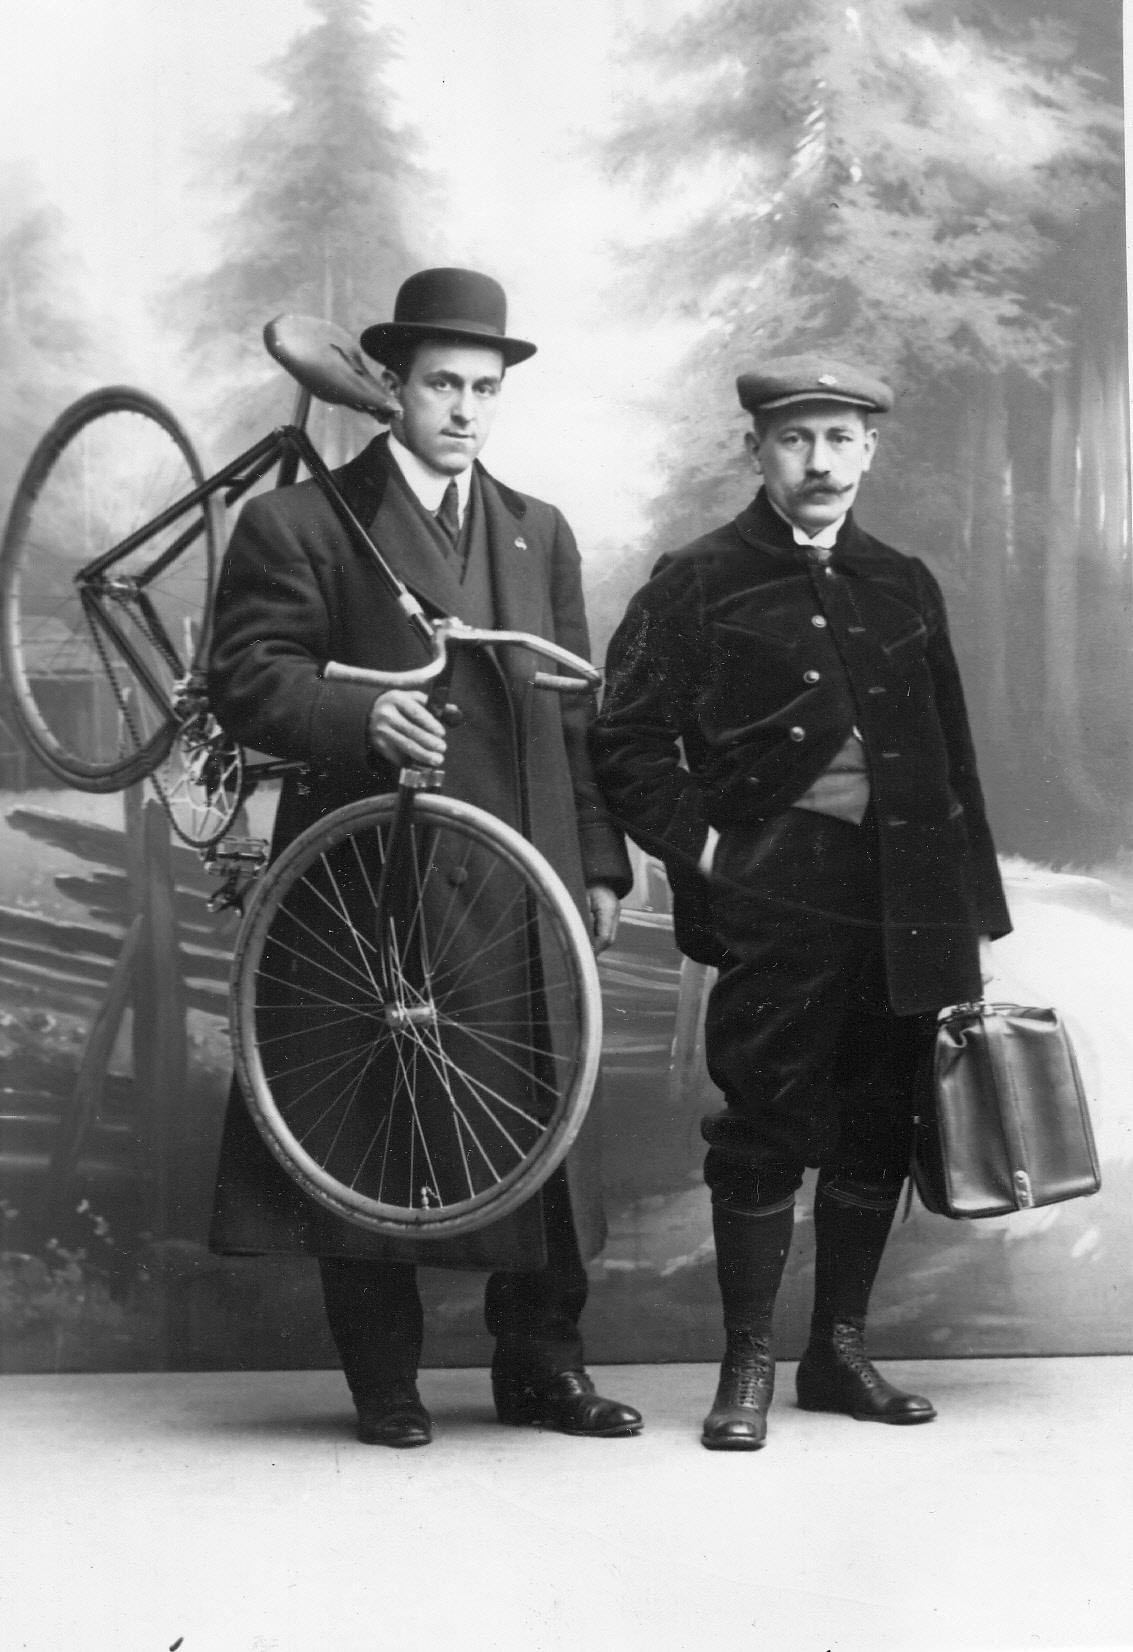 Участник велогонок гонщик Жан Жаклен, чемпион мира (слева)